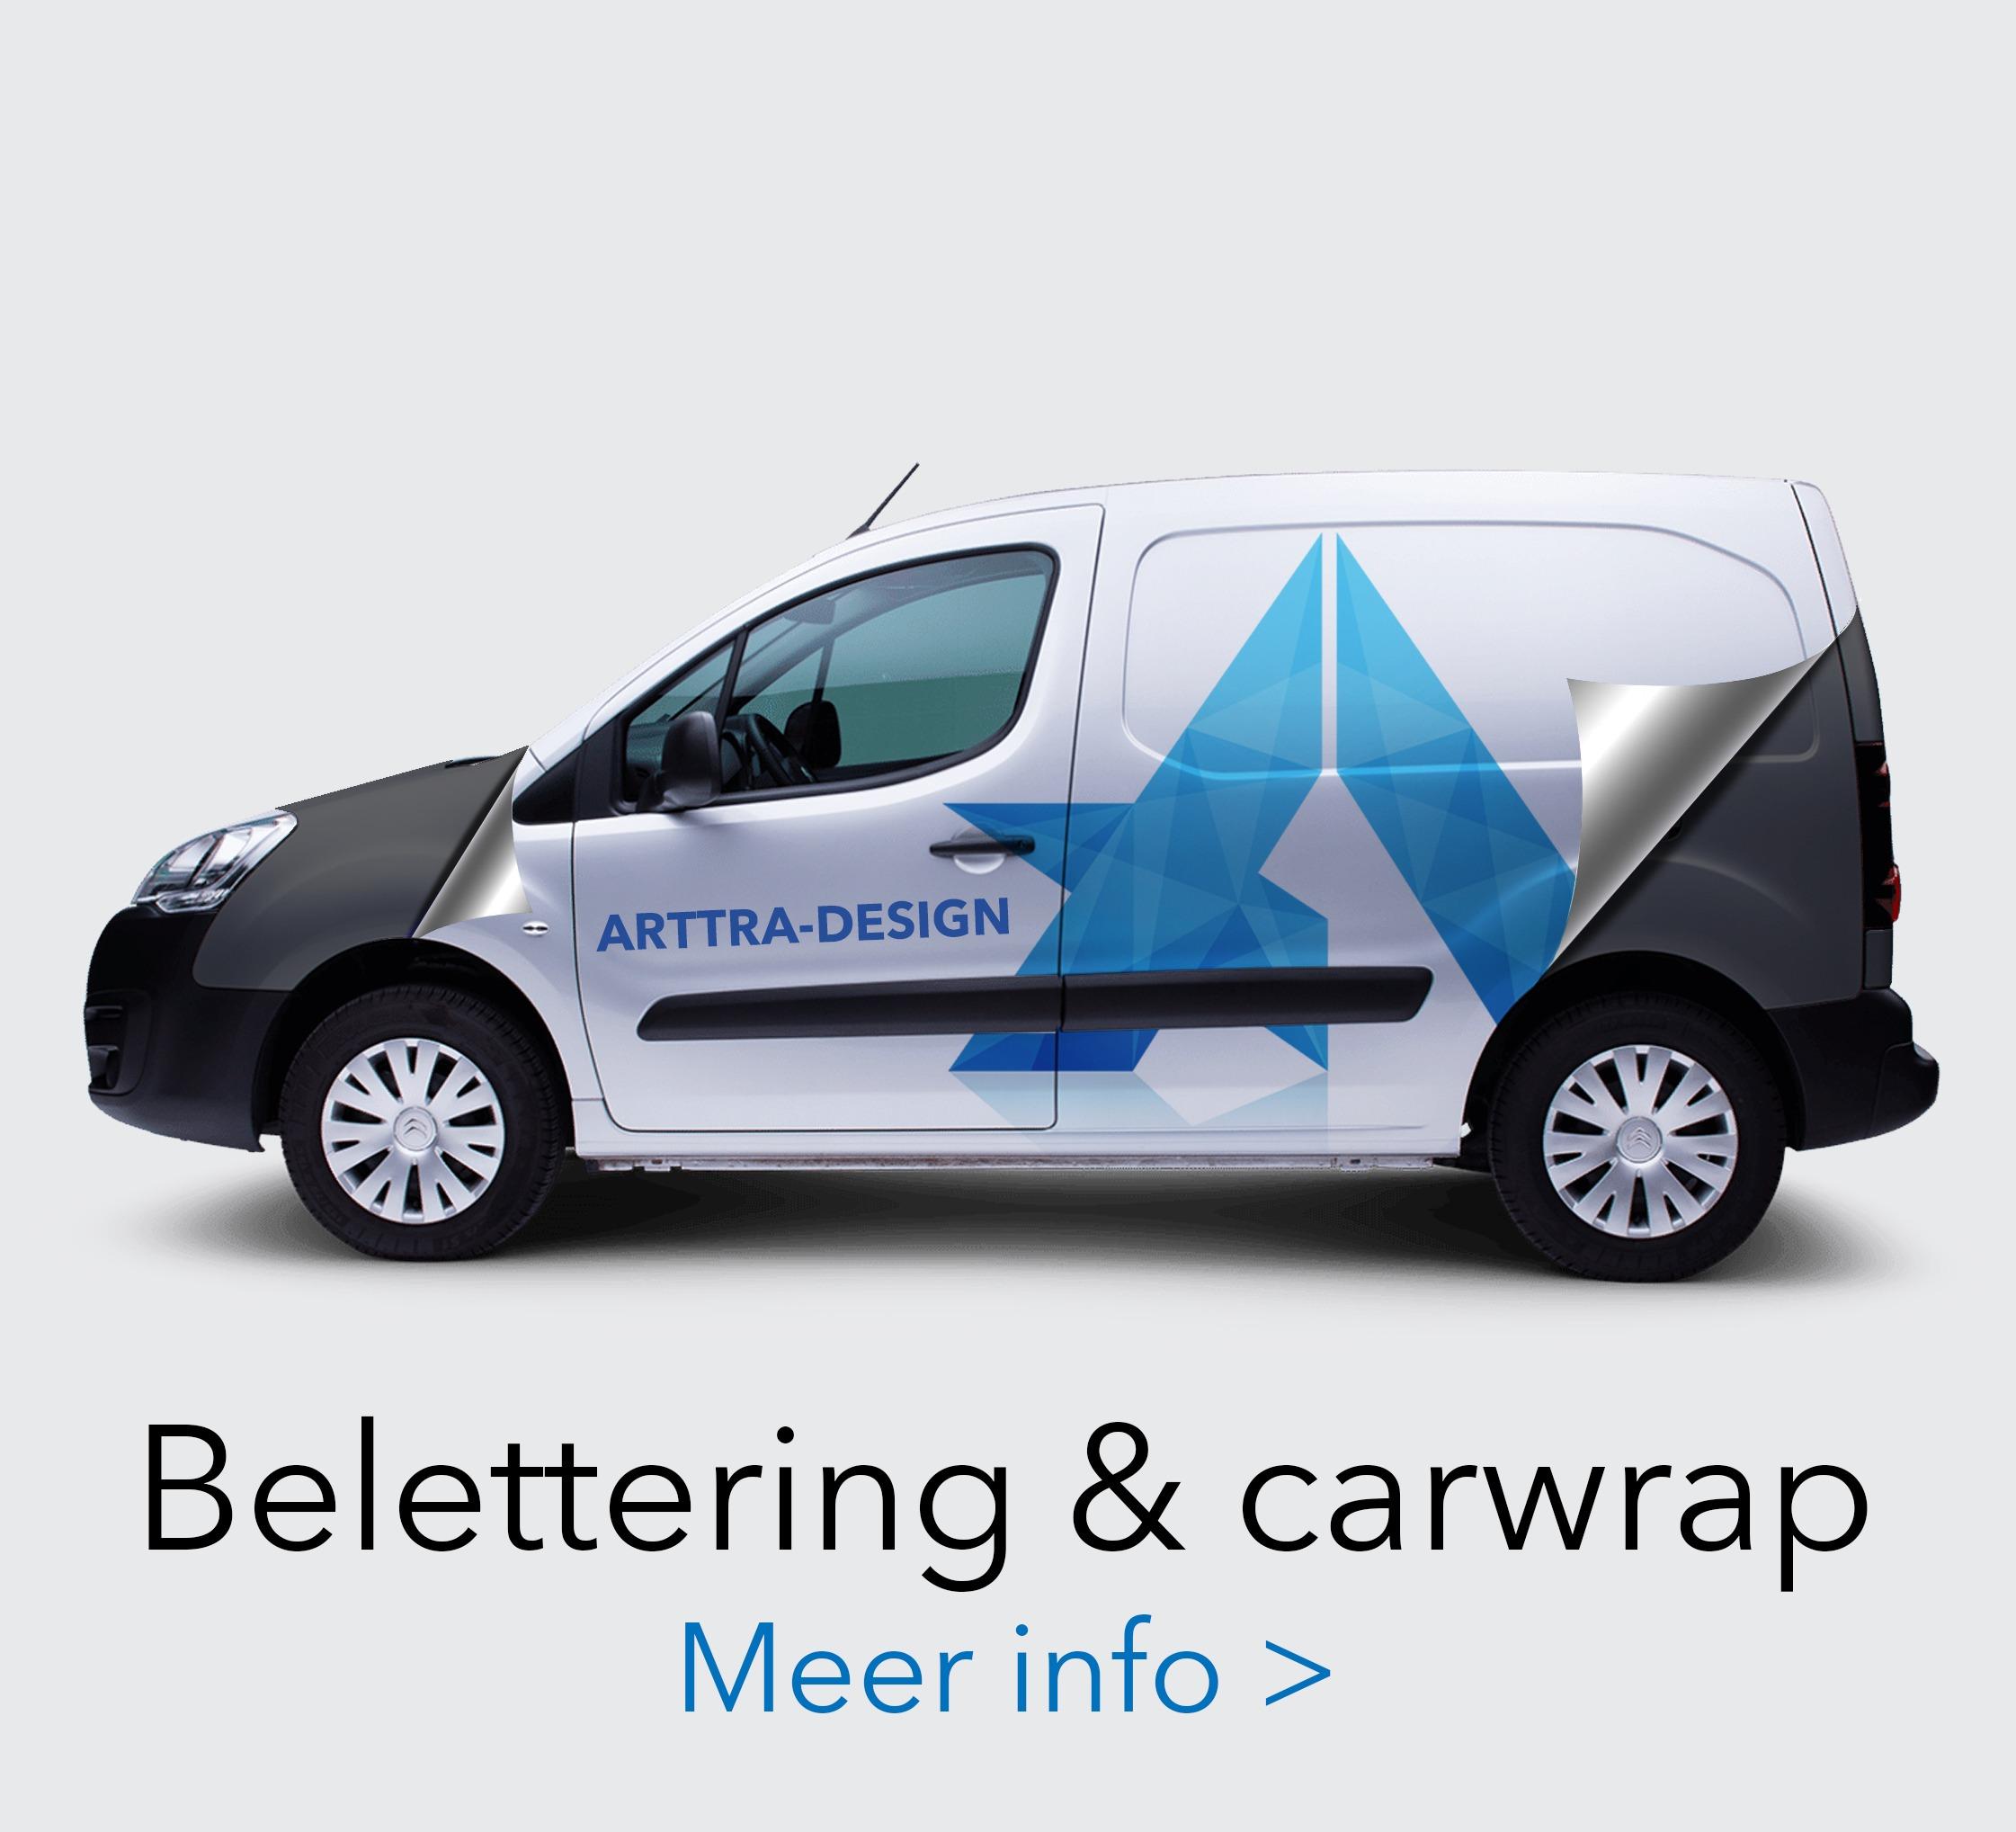 Belettering & carwrap